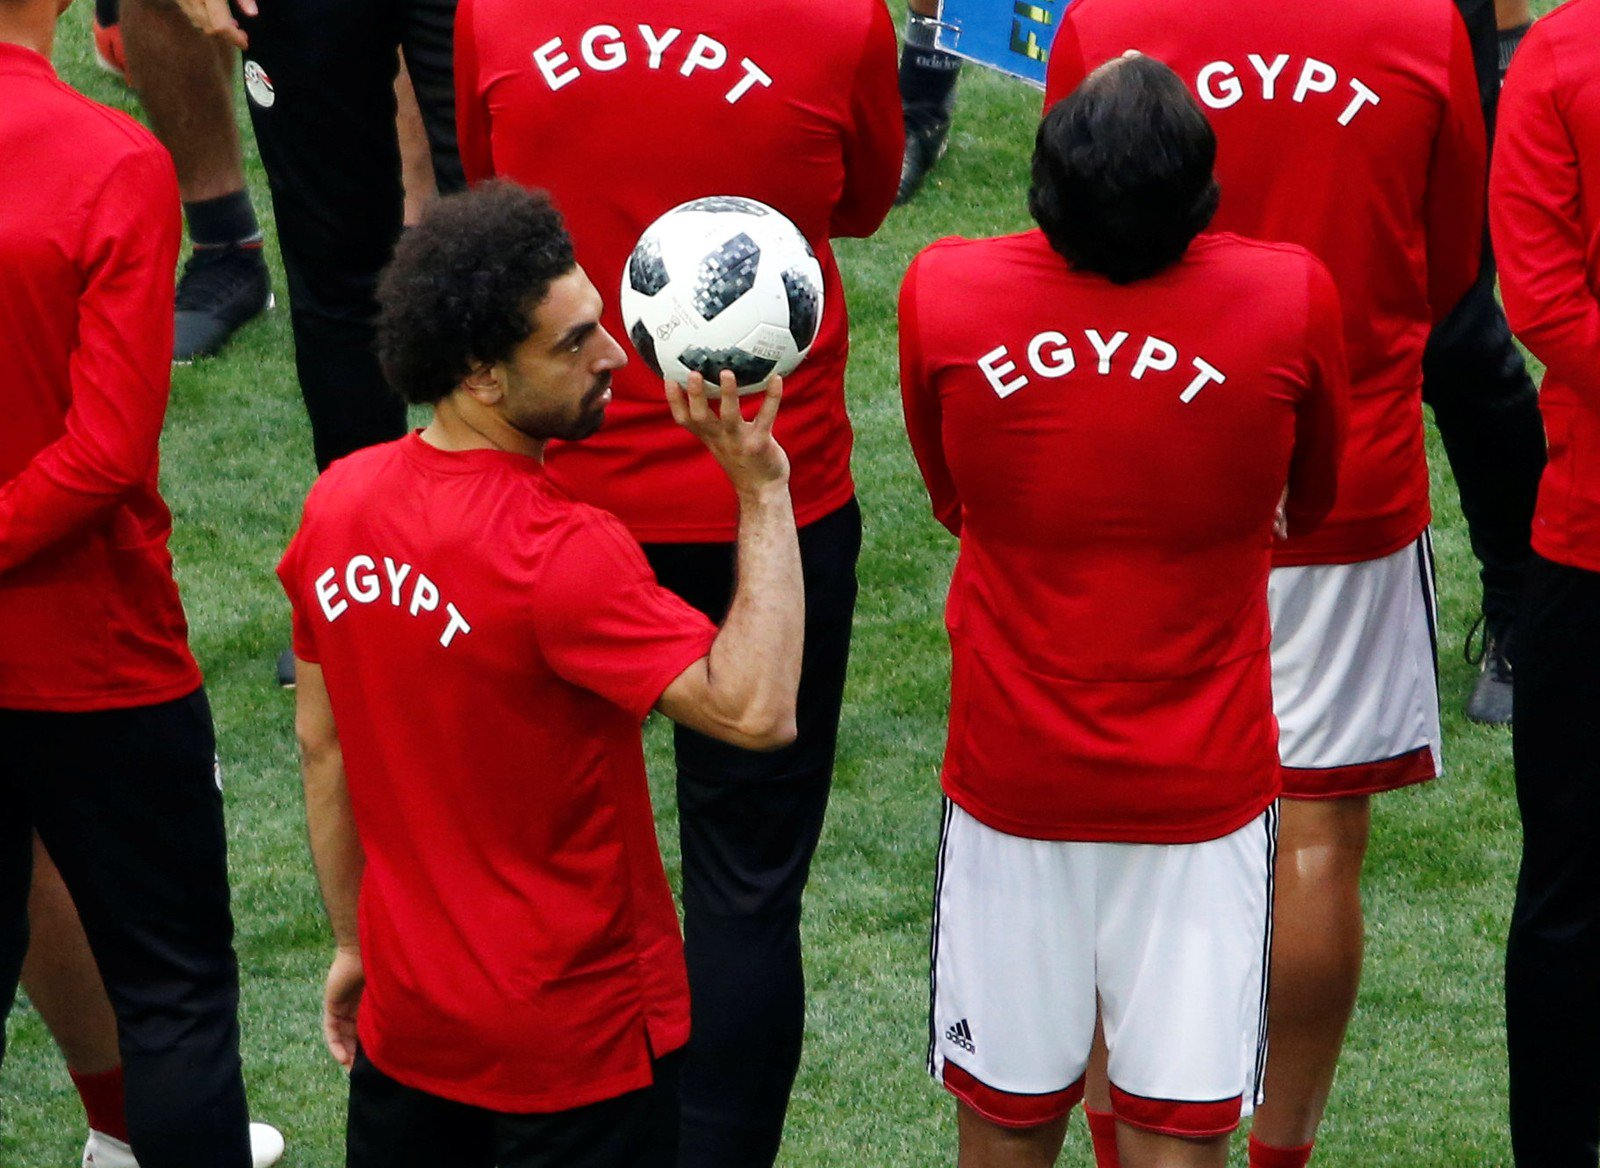 Ainda dúvida contra a Rússia, Salah tem 'Dia D' pelo Egito na Copa do Mundo https://t.co/8xPYWE9cnq https://t.co/0A4ZP8wsfL